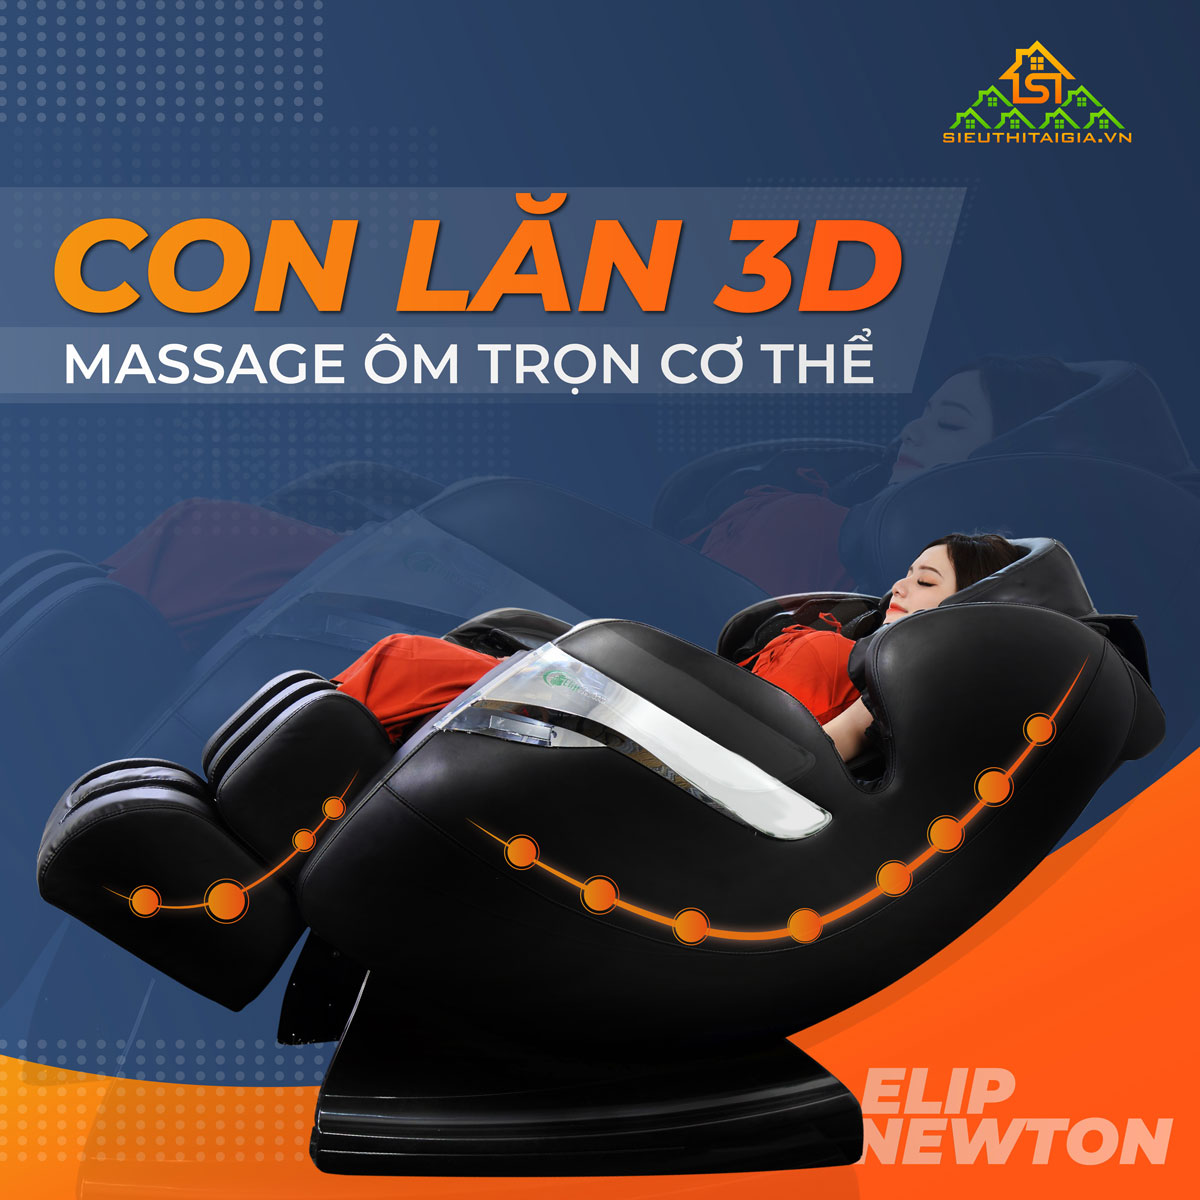 Thiet ke con lan cua Ghe massage Elip Newton